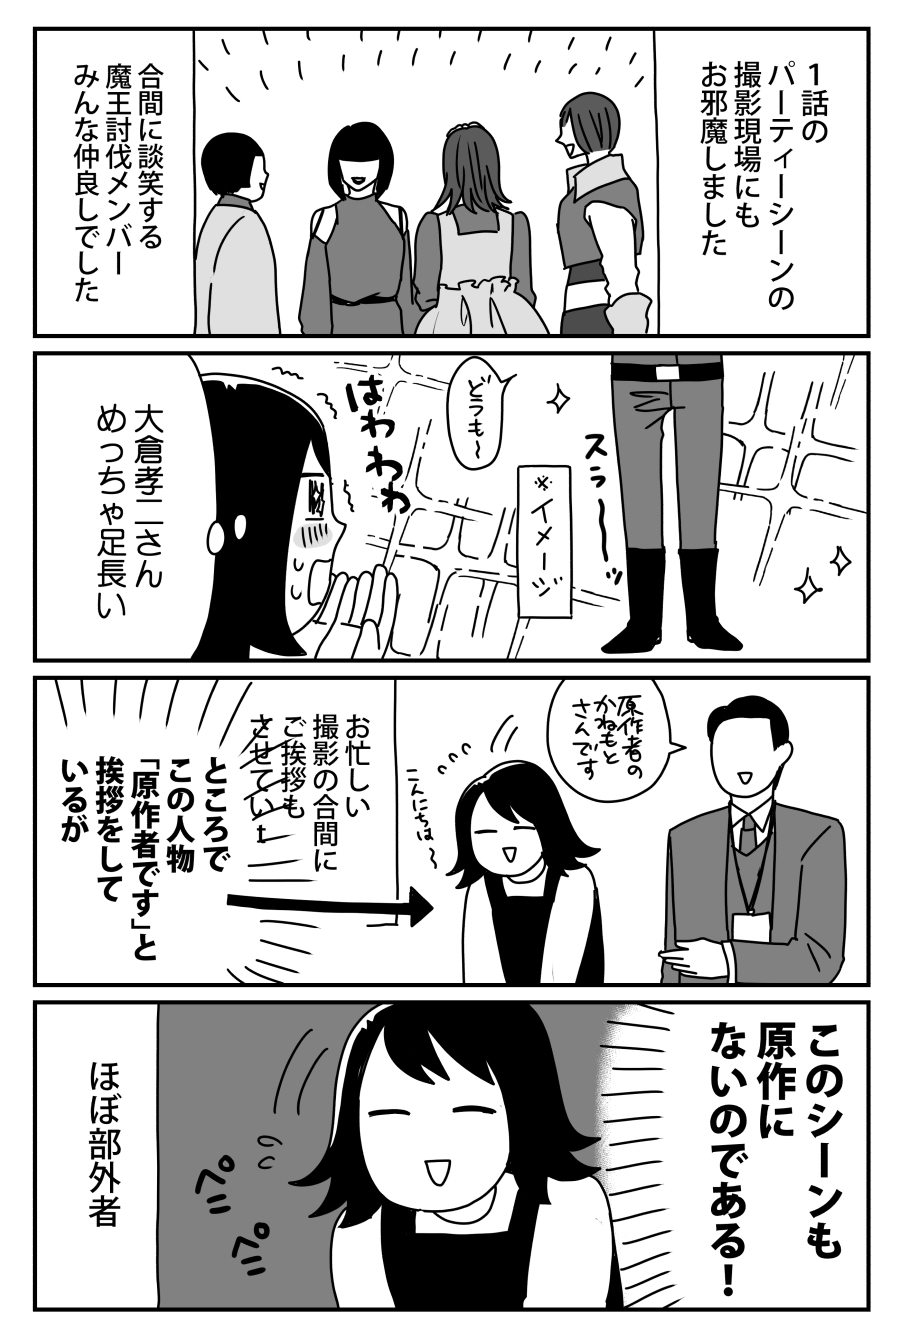 f:id:kanemotonomukuu:20200210172041j:plain